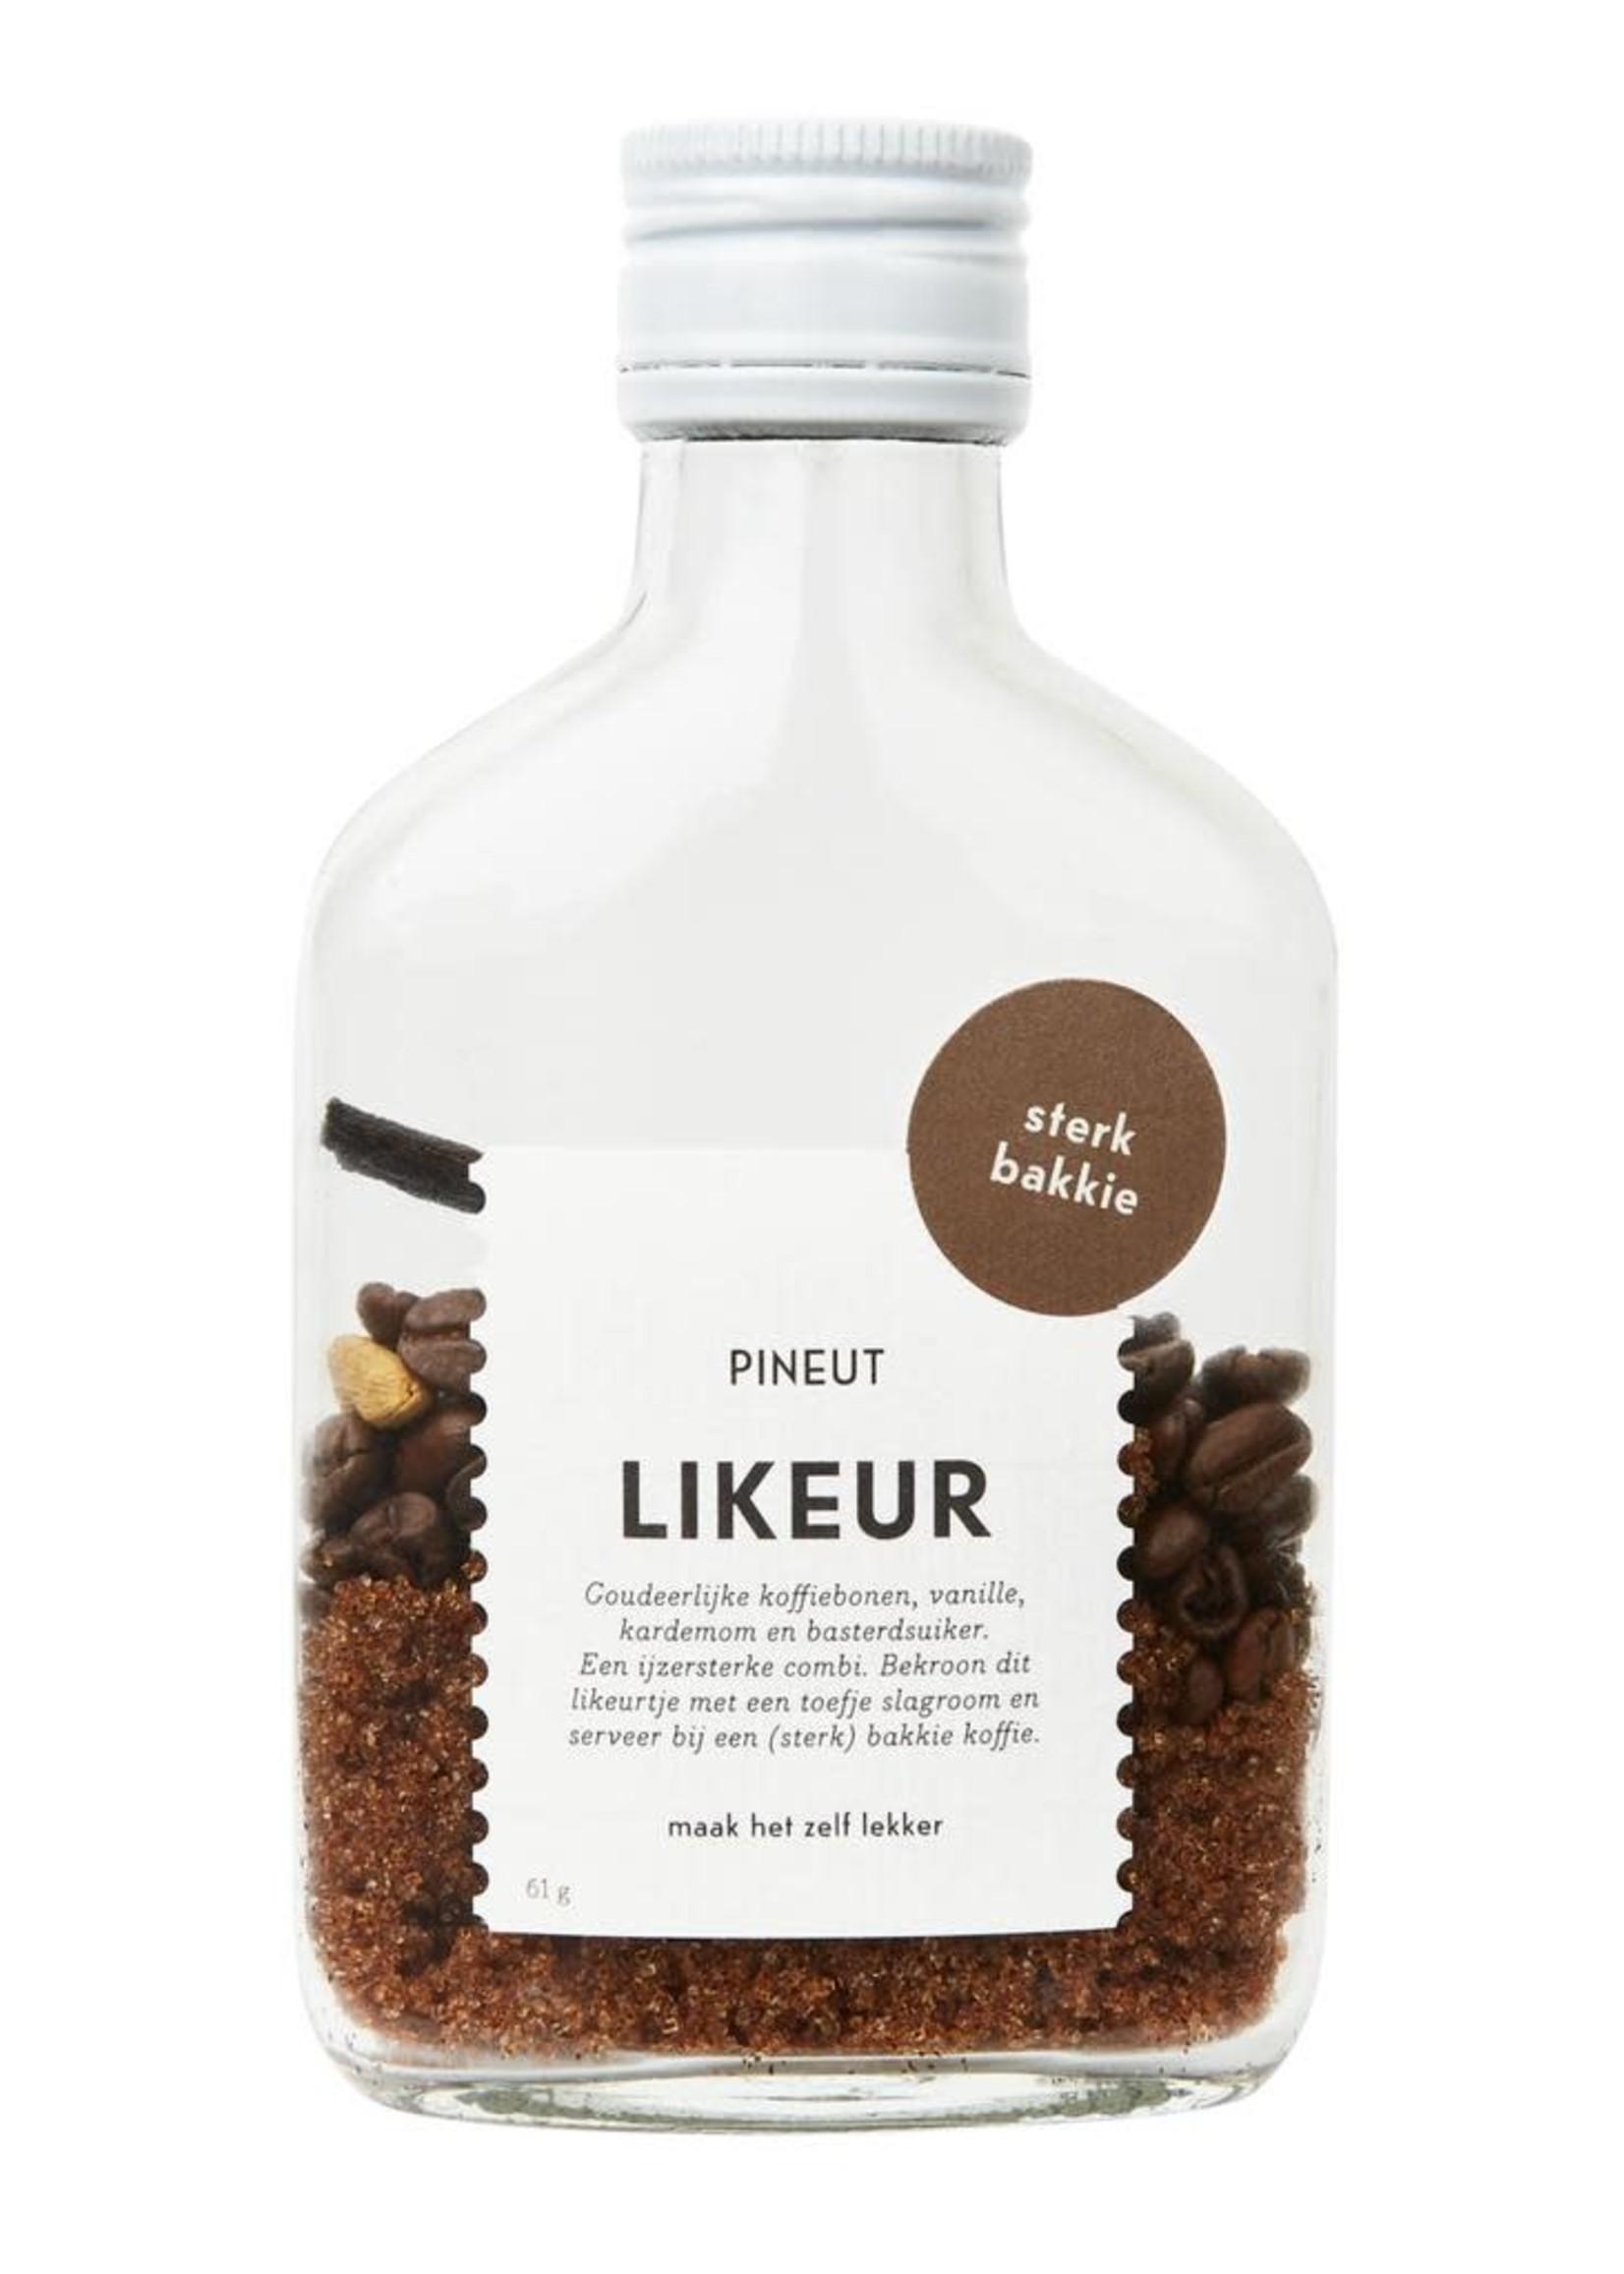 Pineut Pineut- Sterk Bakkie Zakflacon-Likeurtje zelf maken